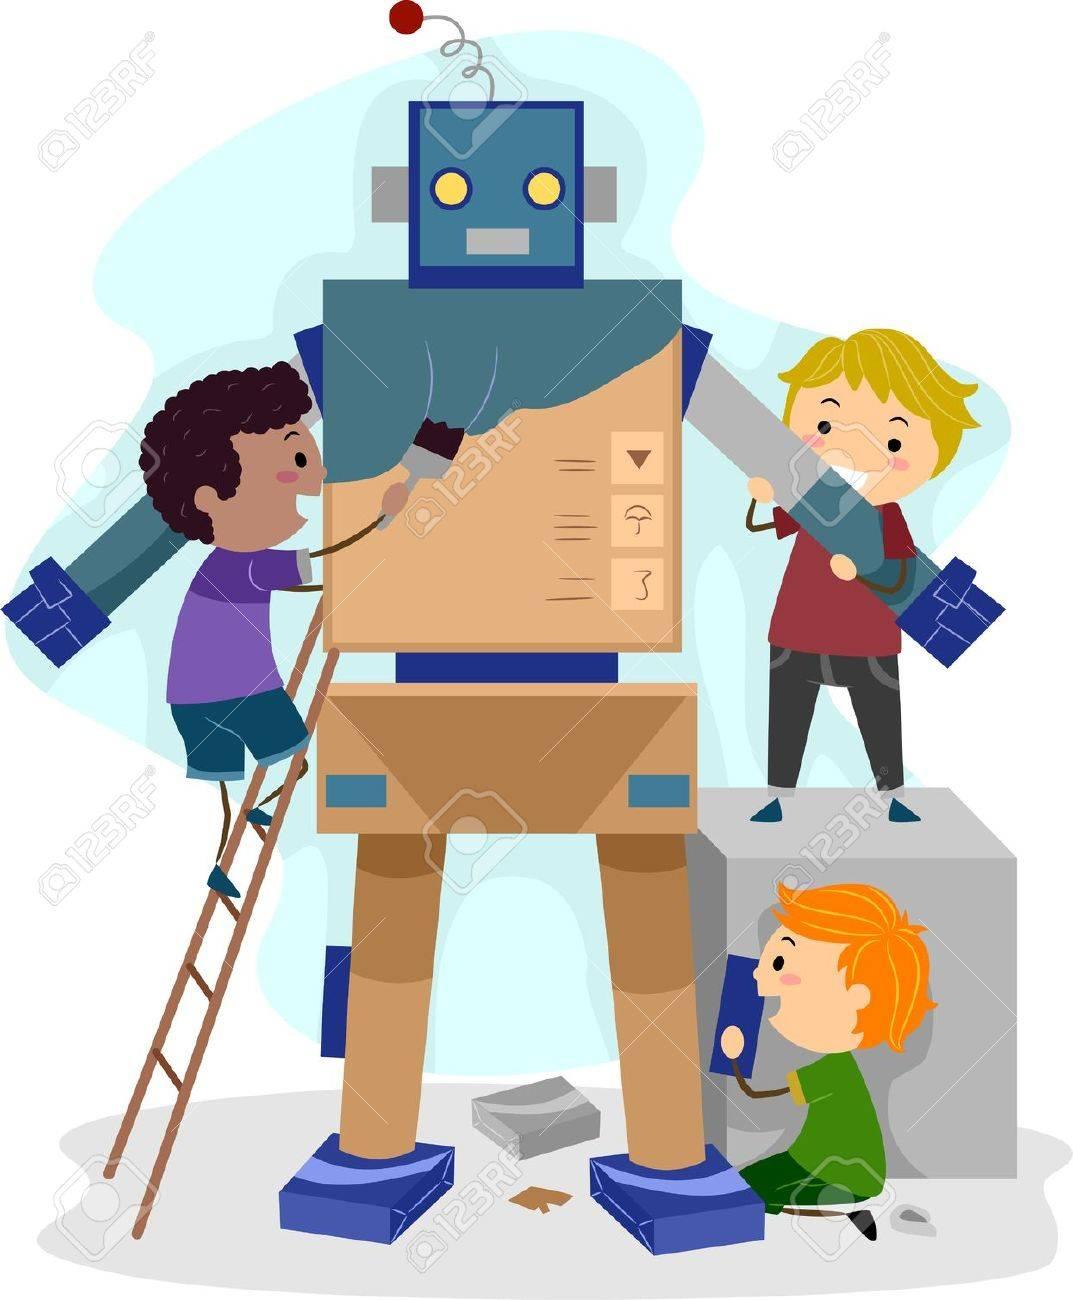 Illustration of Kids Building a Robot Stock Photo - 11197736